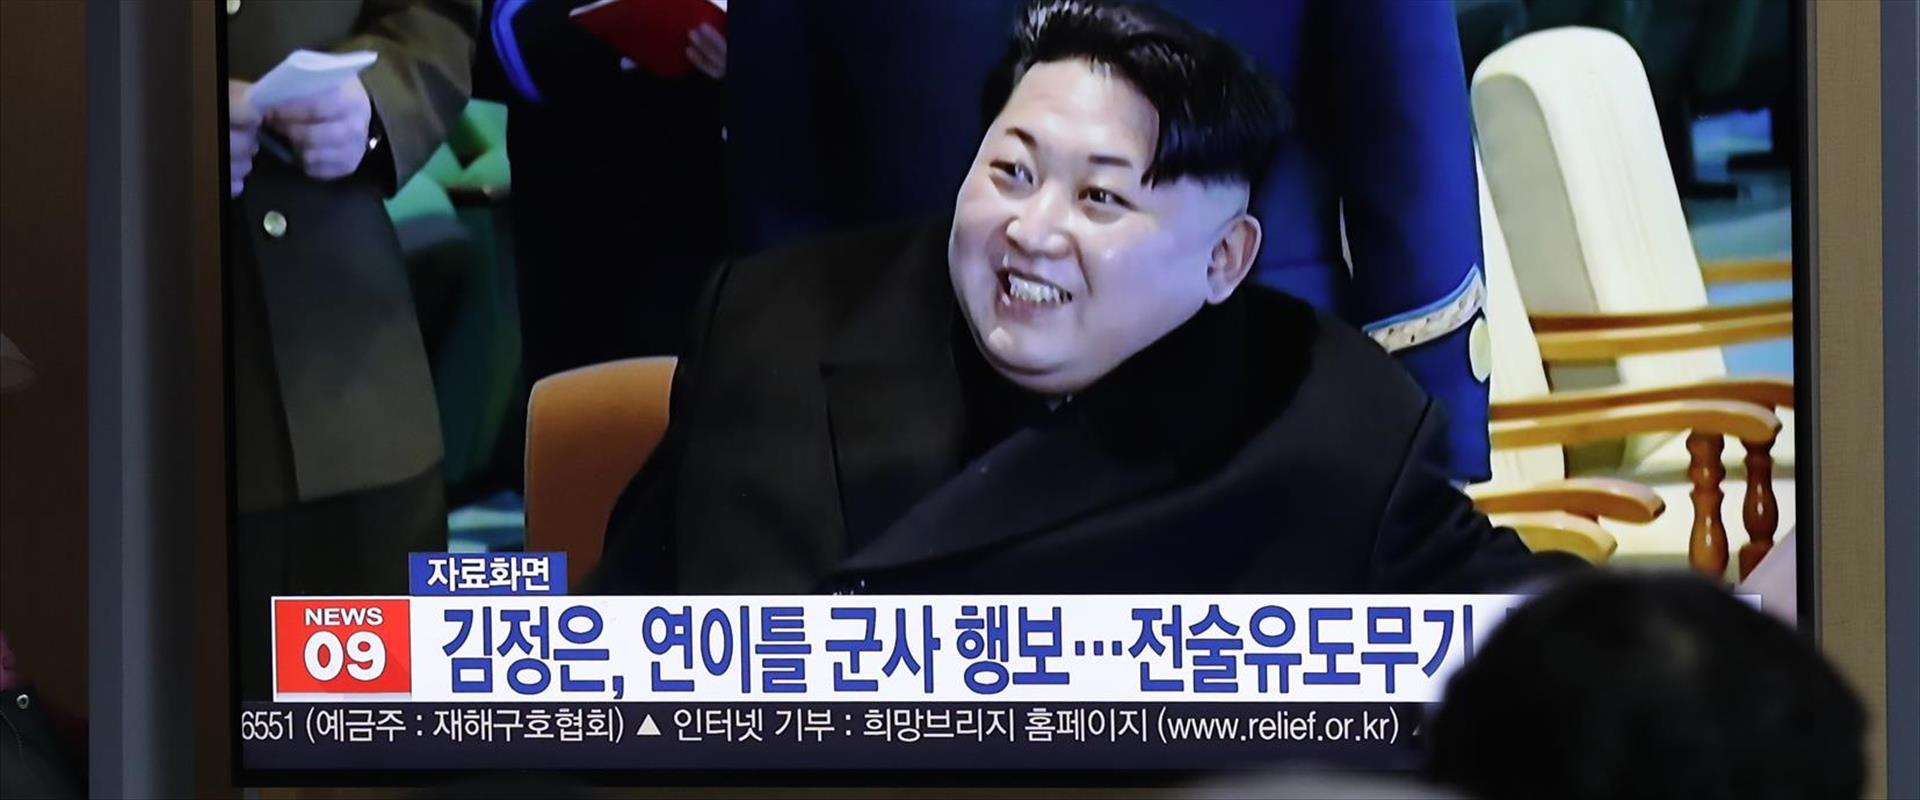 קים ג'ונג און